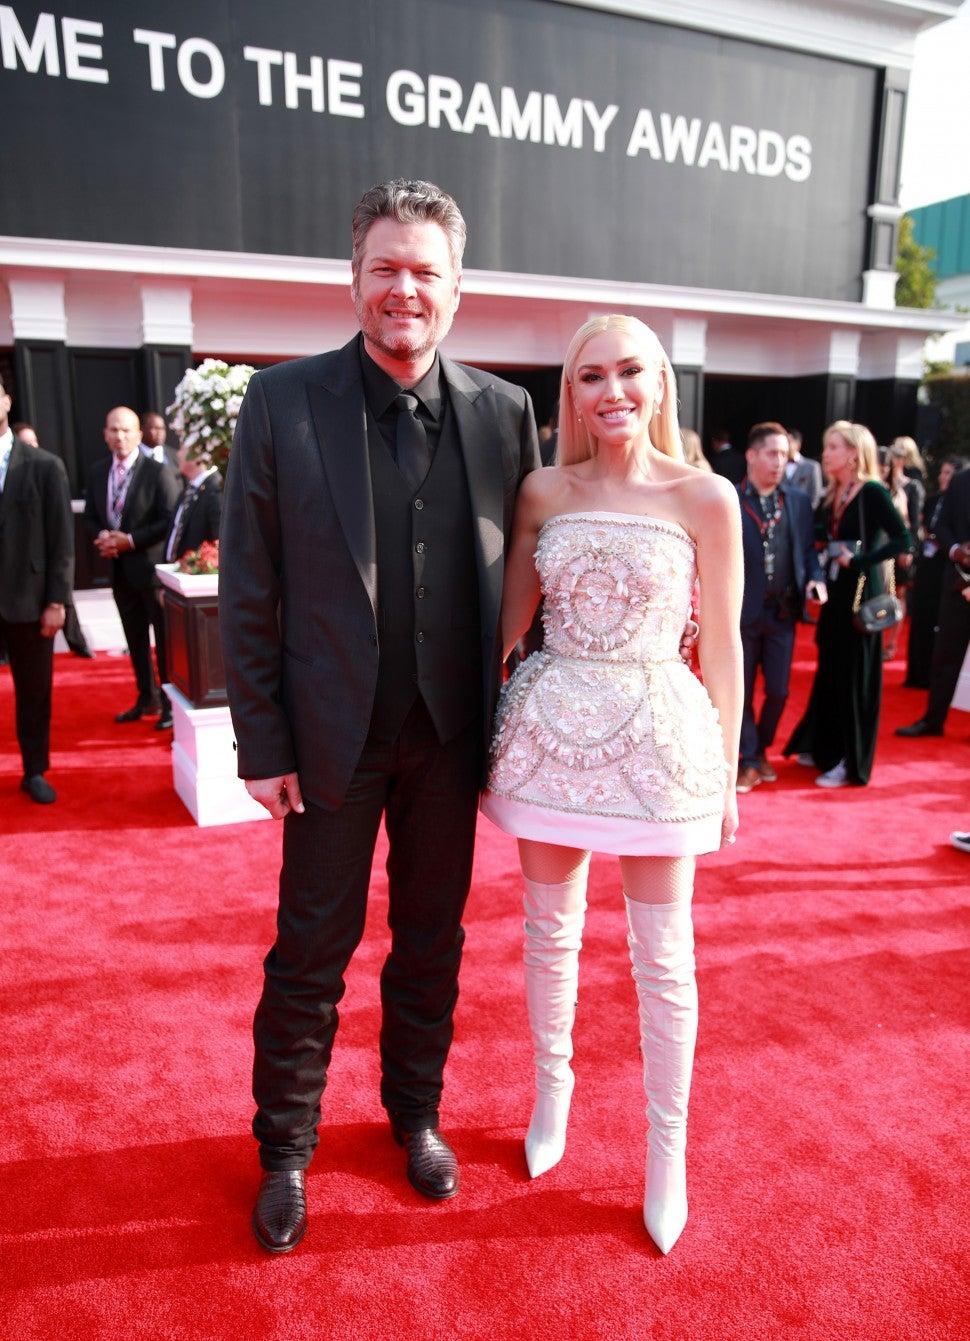 Blake Shelton And Gwen Stefani Arrive At The 2020 Grammys